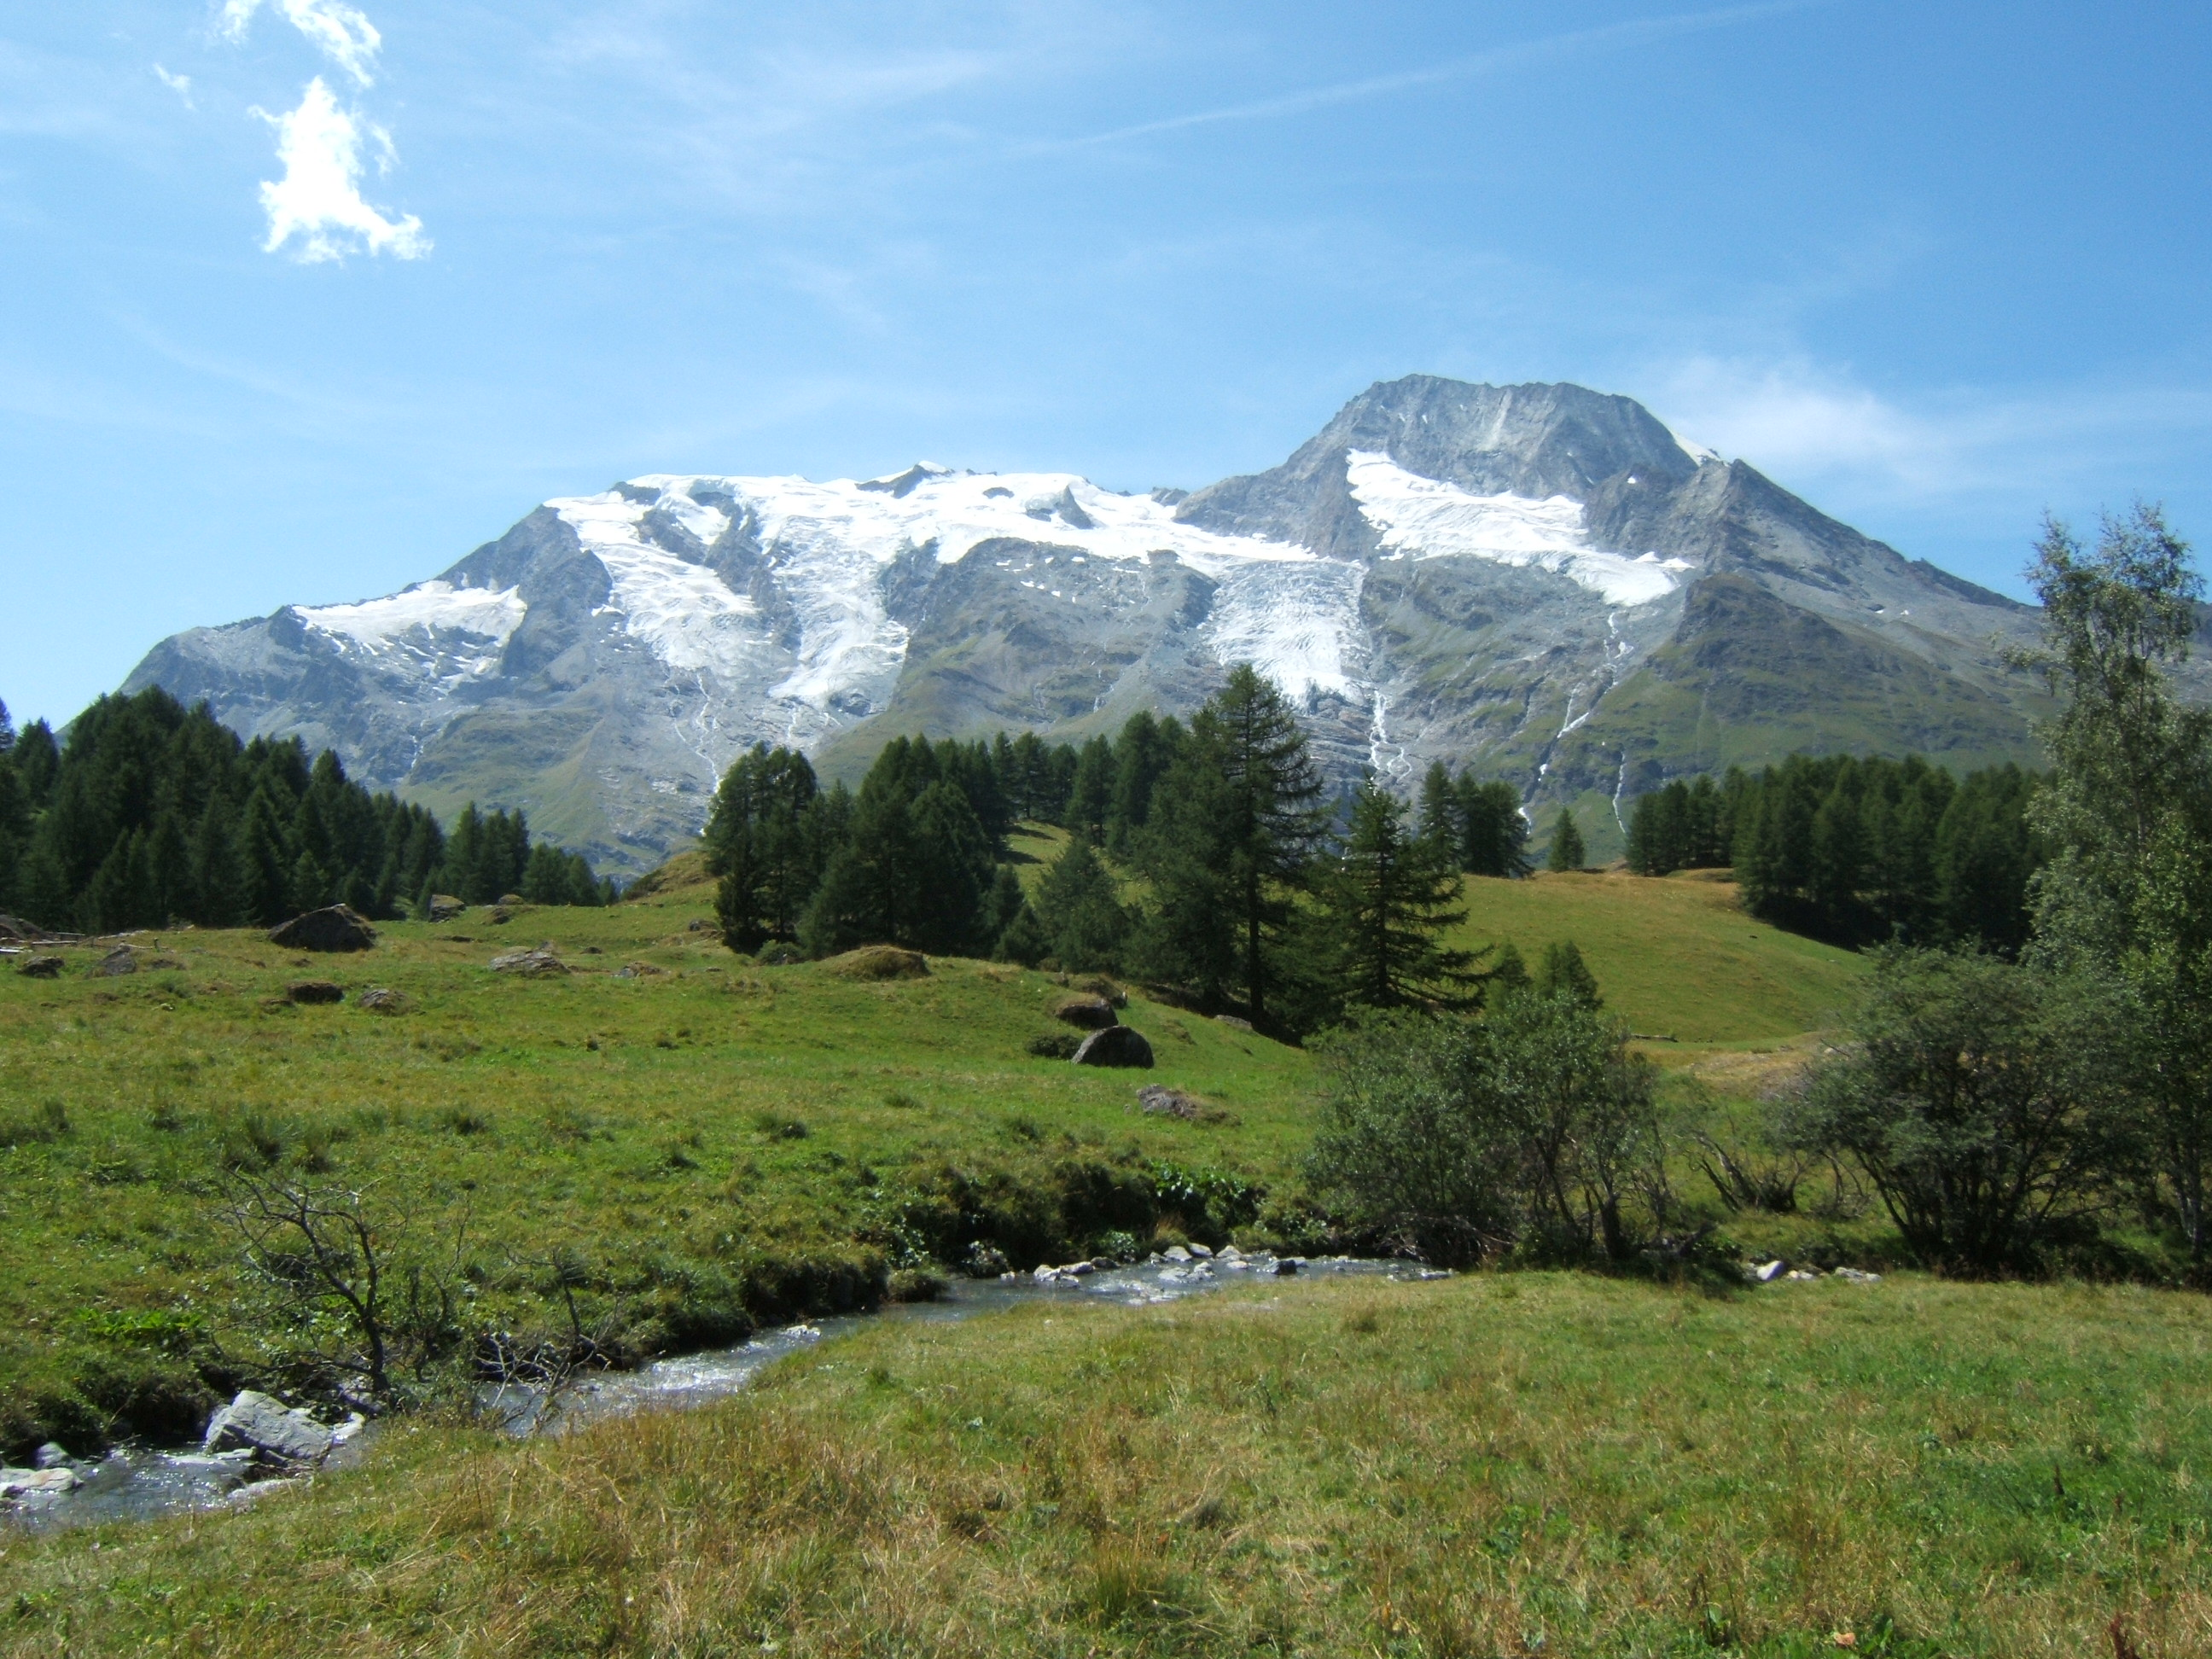 File:Le-Monal-Vanoise-Savoie.JPG - Wikimedia Commons